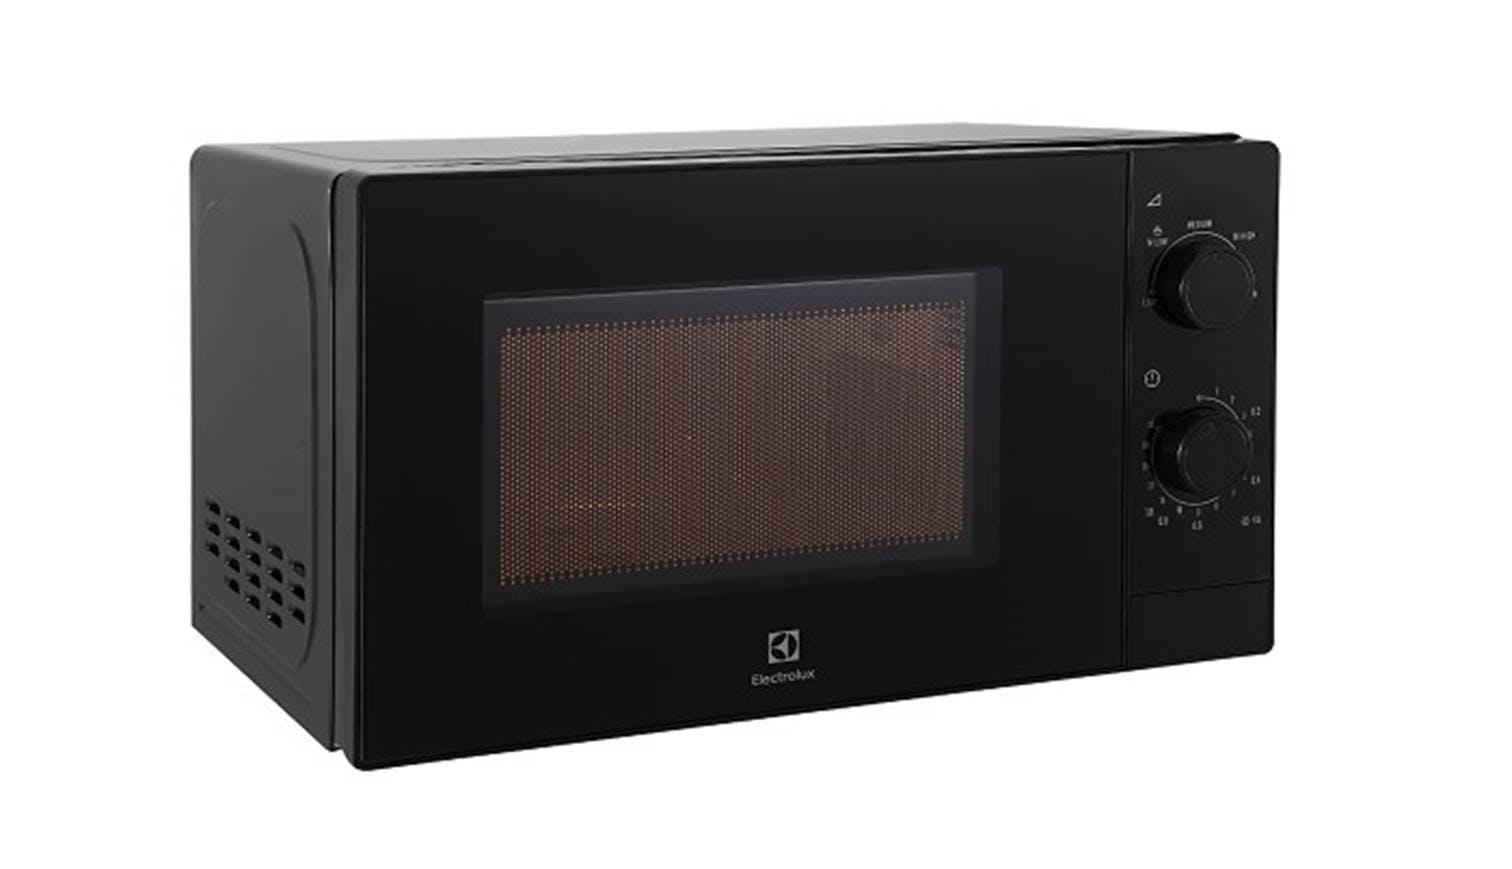 Electolux Emm 2022mk Microwave Oven Harvey Norman Singapore